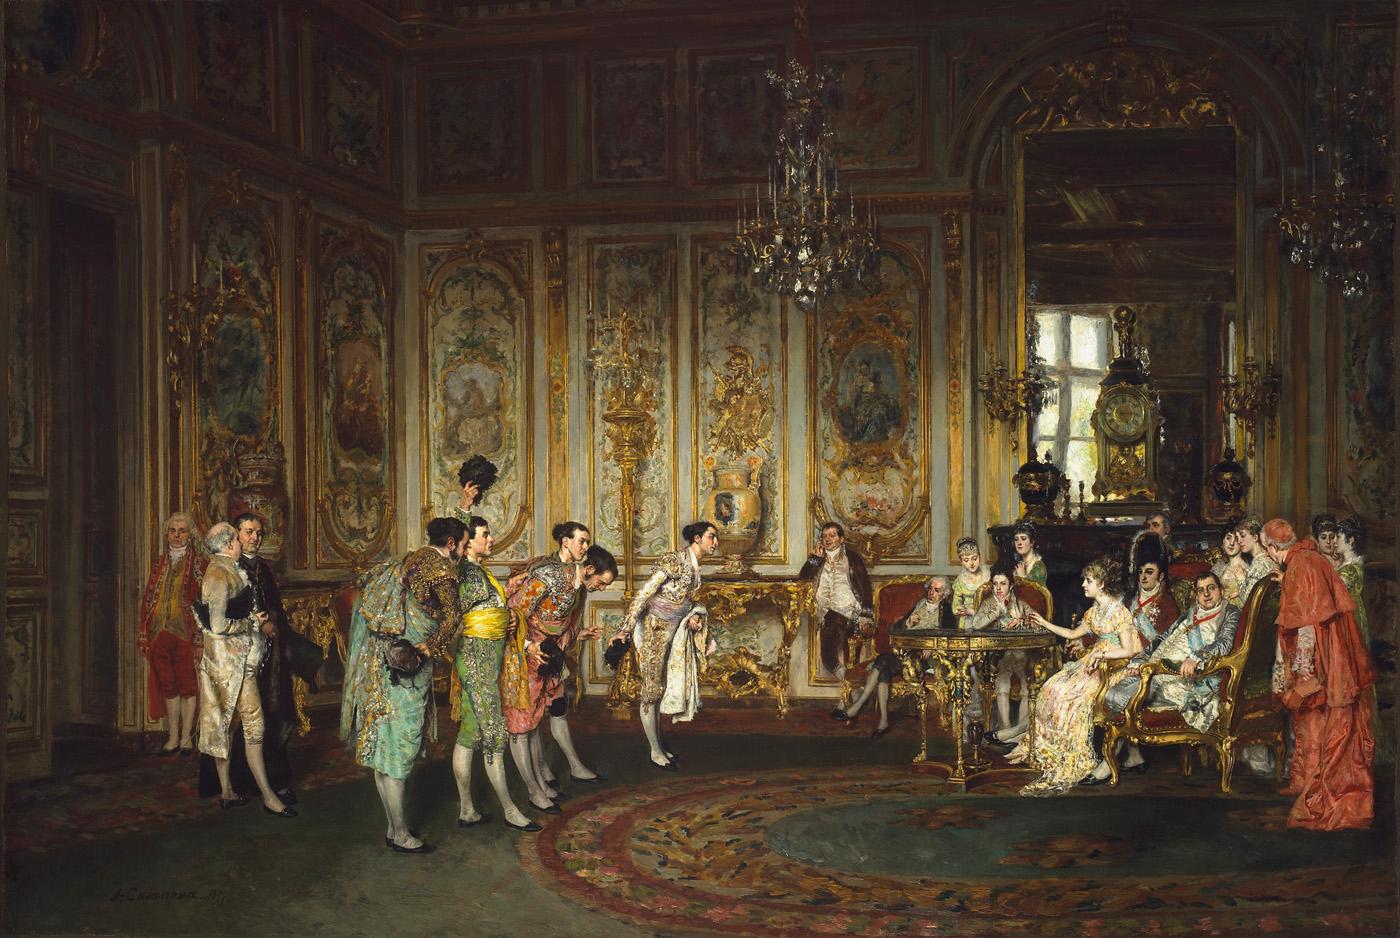 Antoni Casanova Estorach, Els favorits de la cort de Ferran VII, 1887. Font: Meadows Museum Dallas